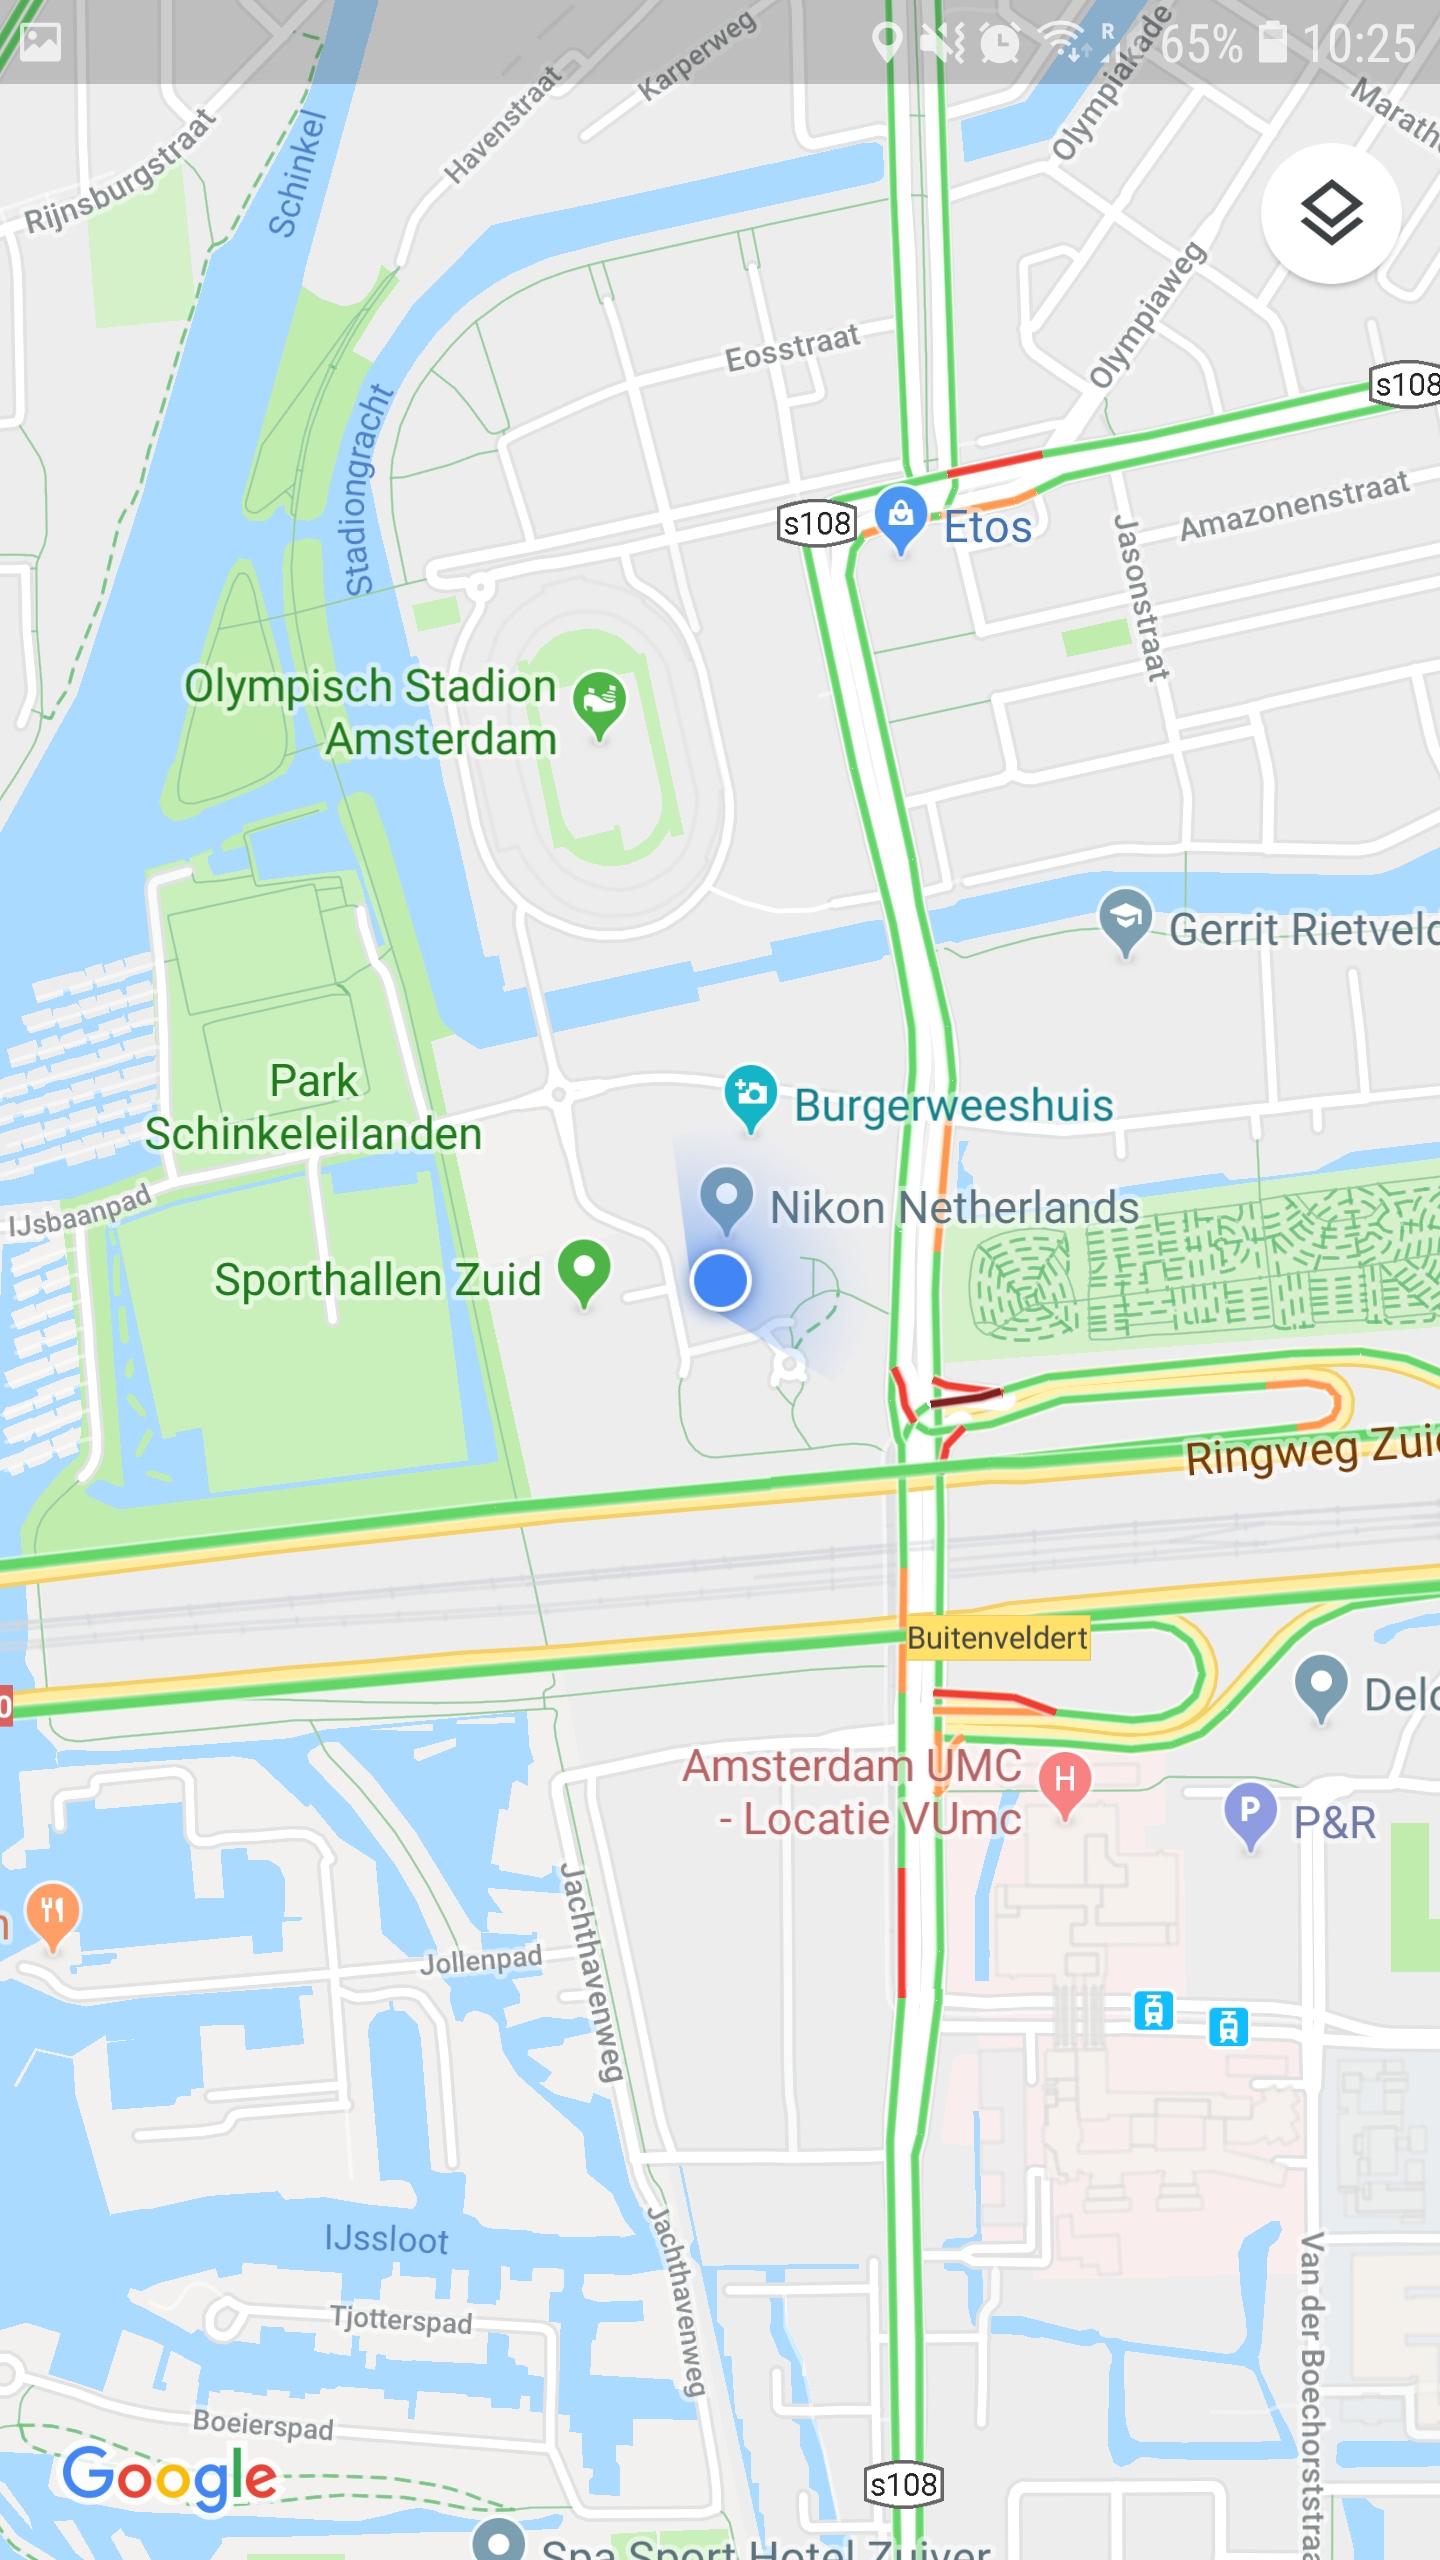 Google News - Google Maps - Neueste